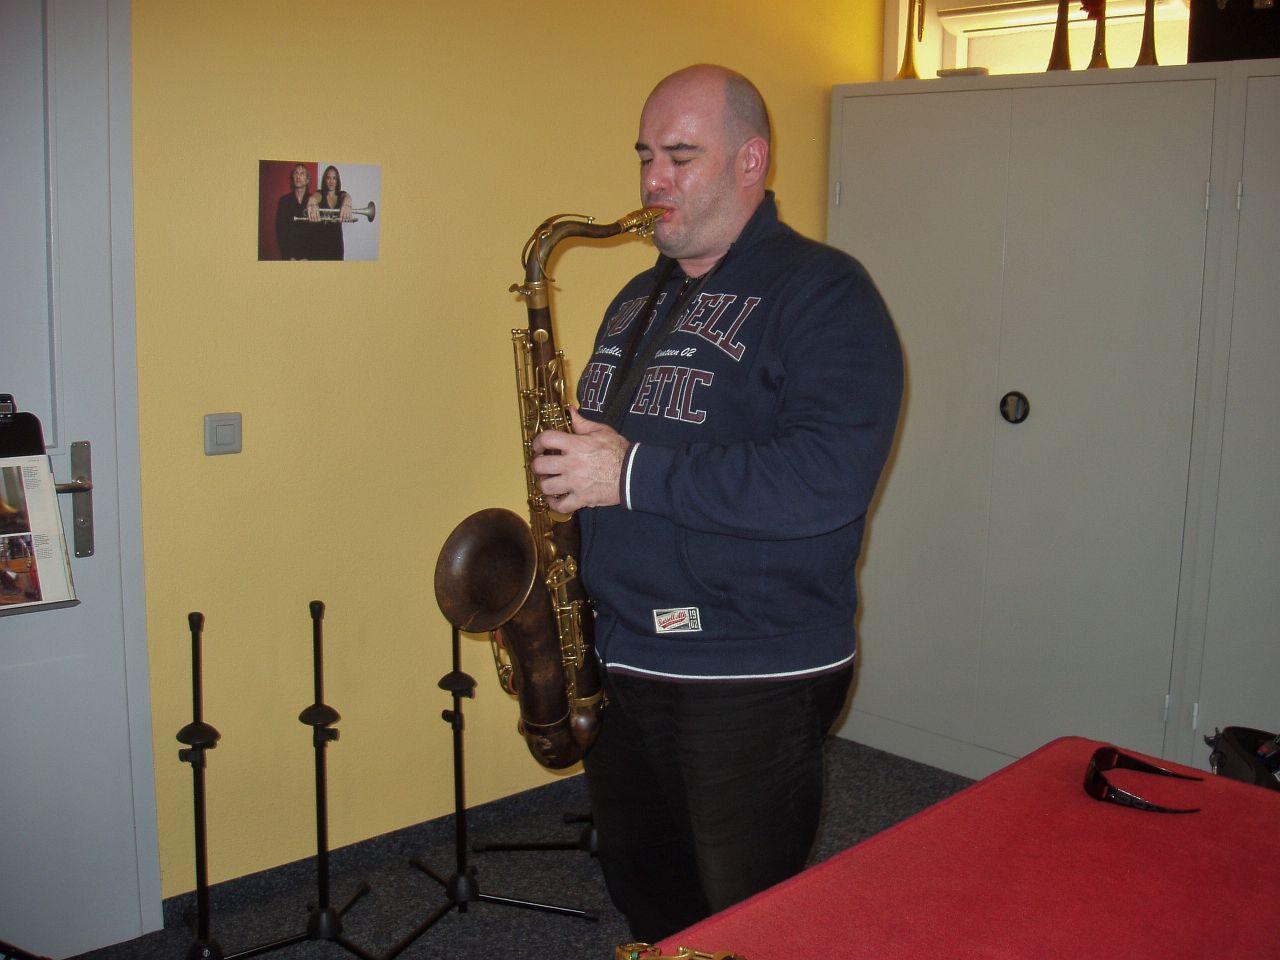 Musiker 111